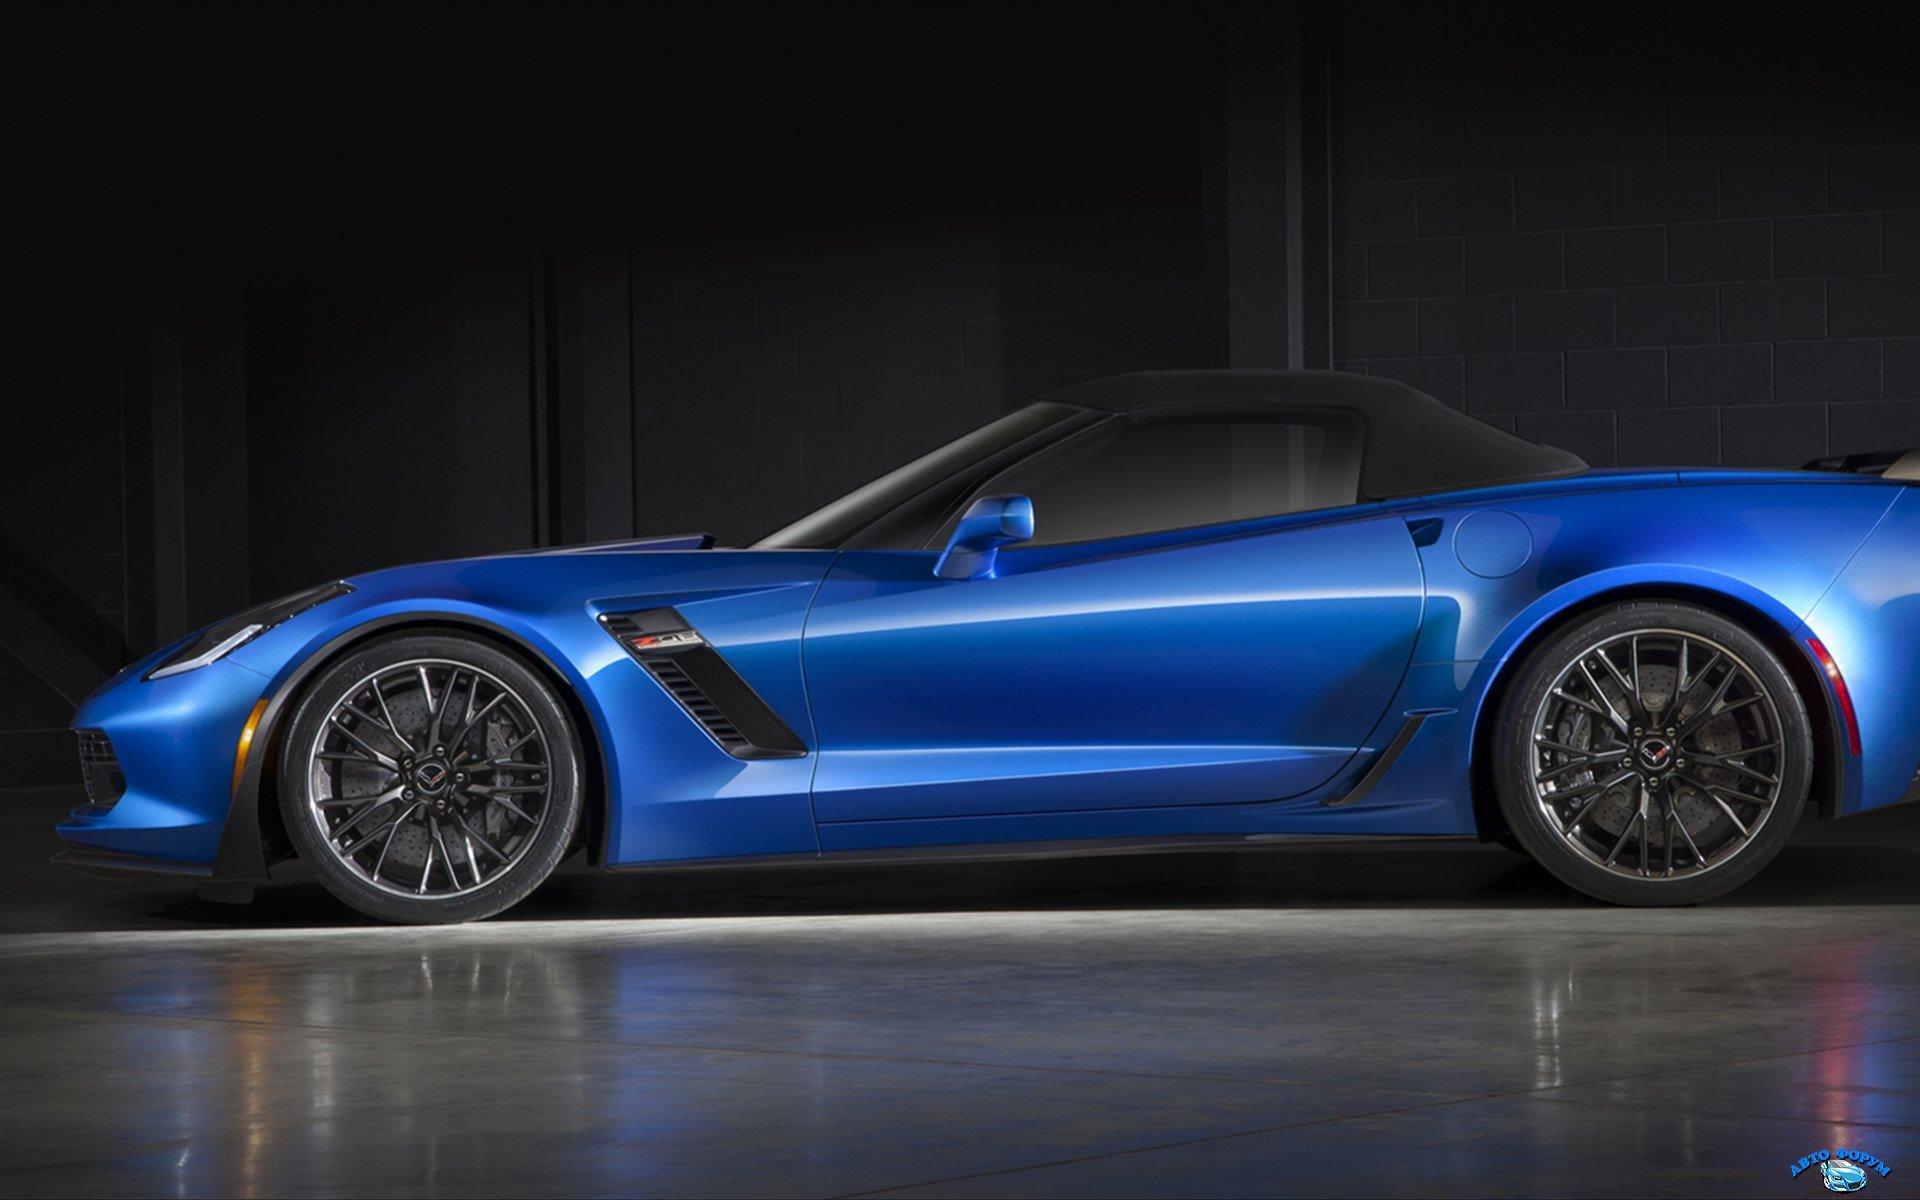 Chevrolet-Corvette-Z06-Convertible-2015-widescreen-10.jpg